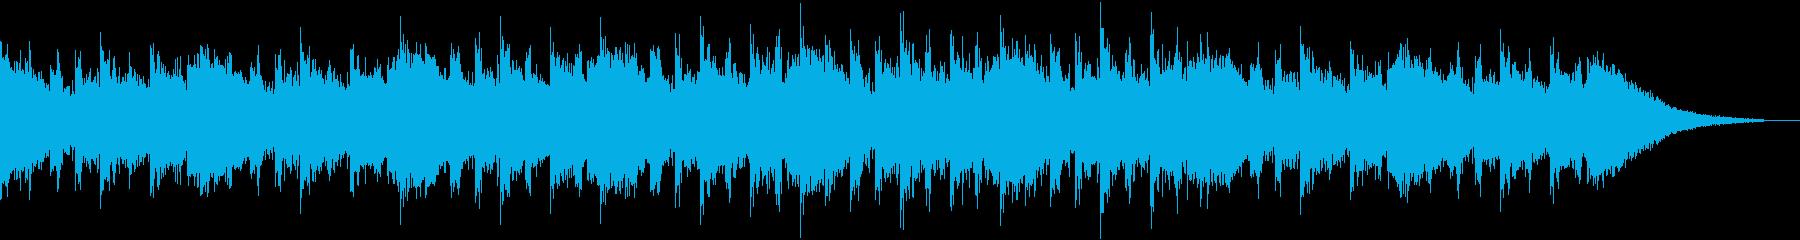 Glitch Textureの再生済みの波形